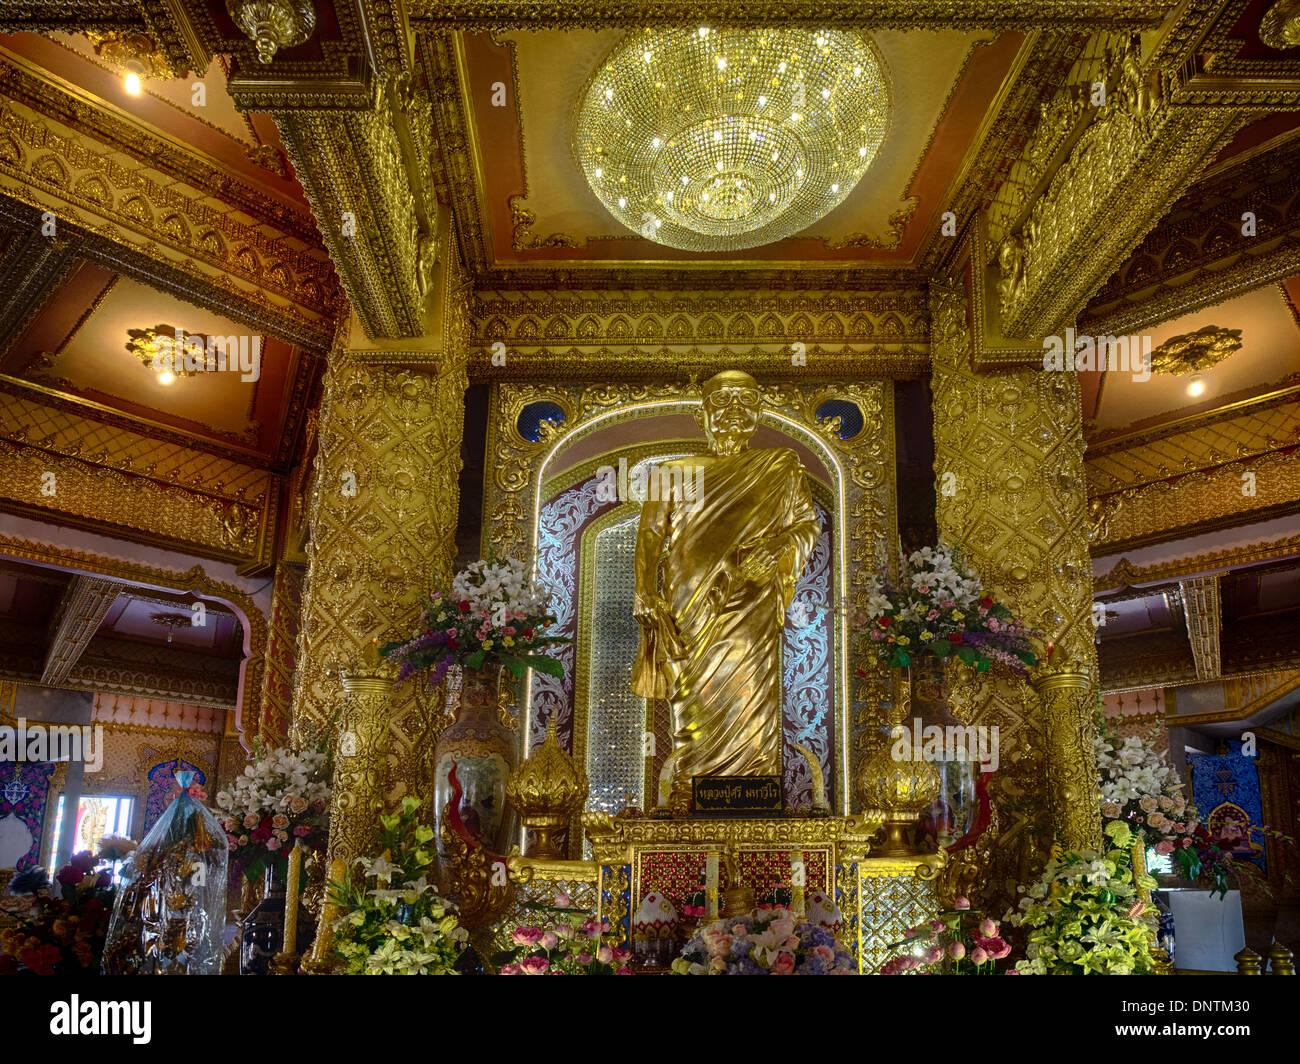 Revered Monk  at Phra Maha Chedi Mongkol, Roi Et, Thailand - Stock Image